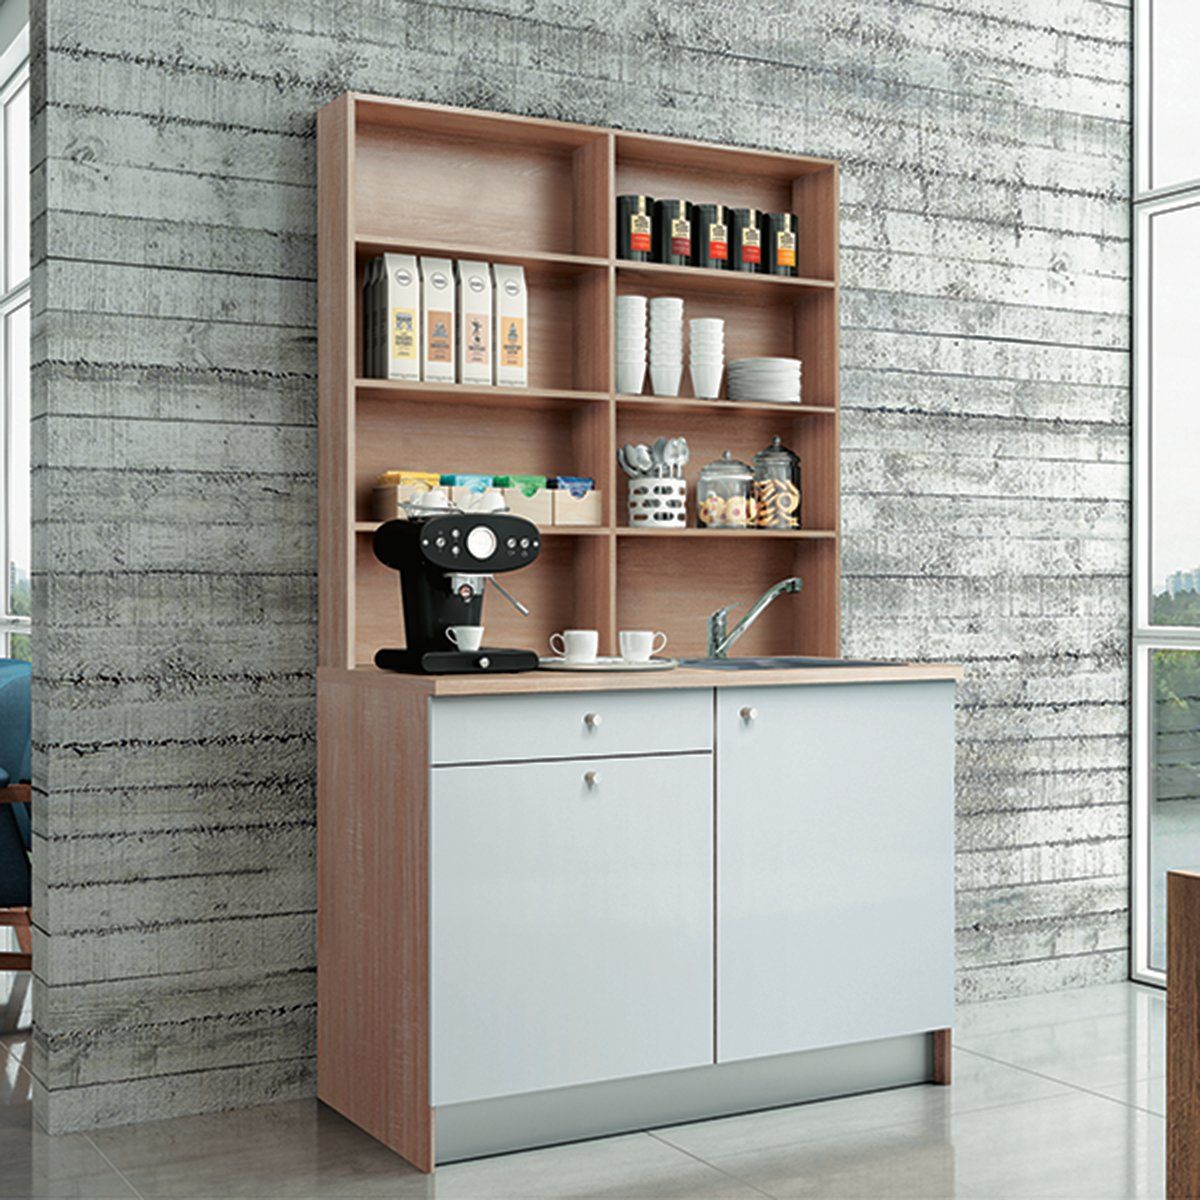 Cucine-monoblocco-leroy merlin 9